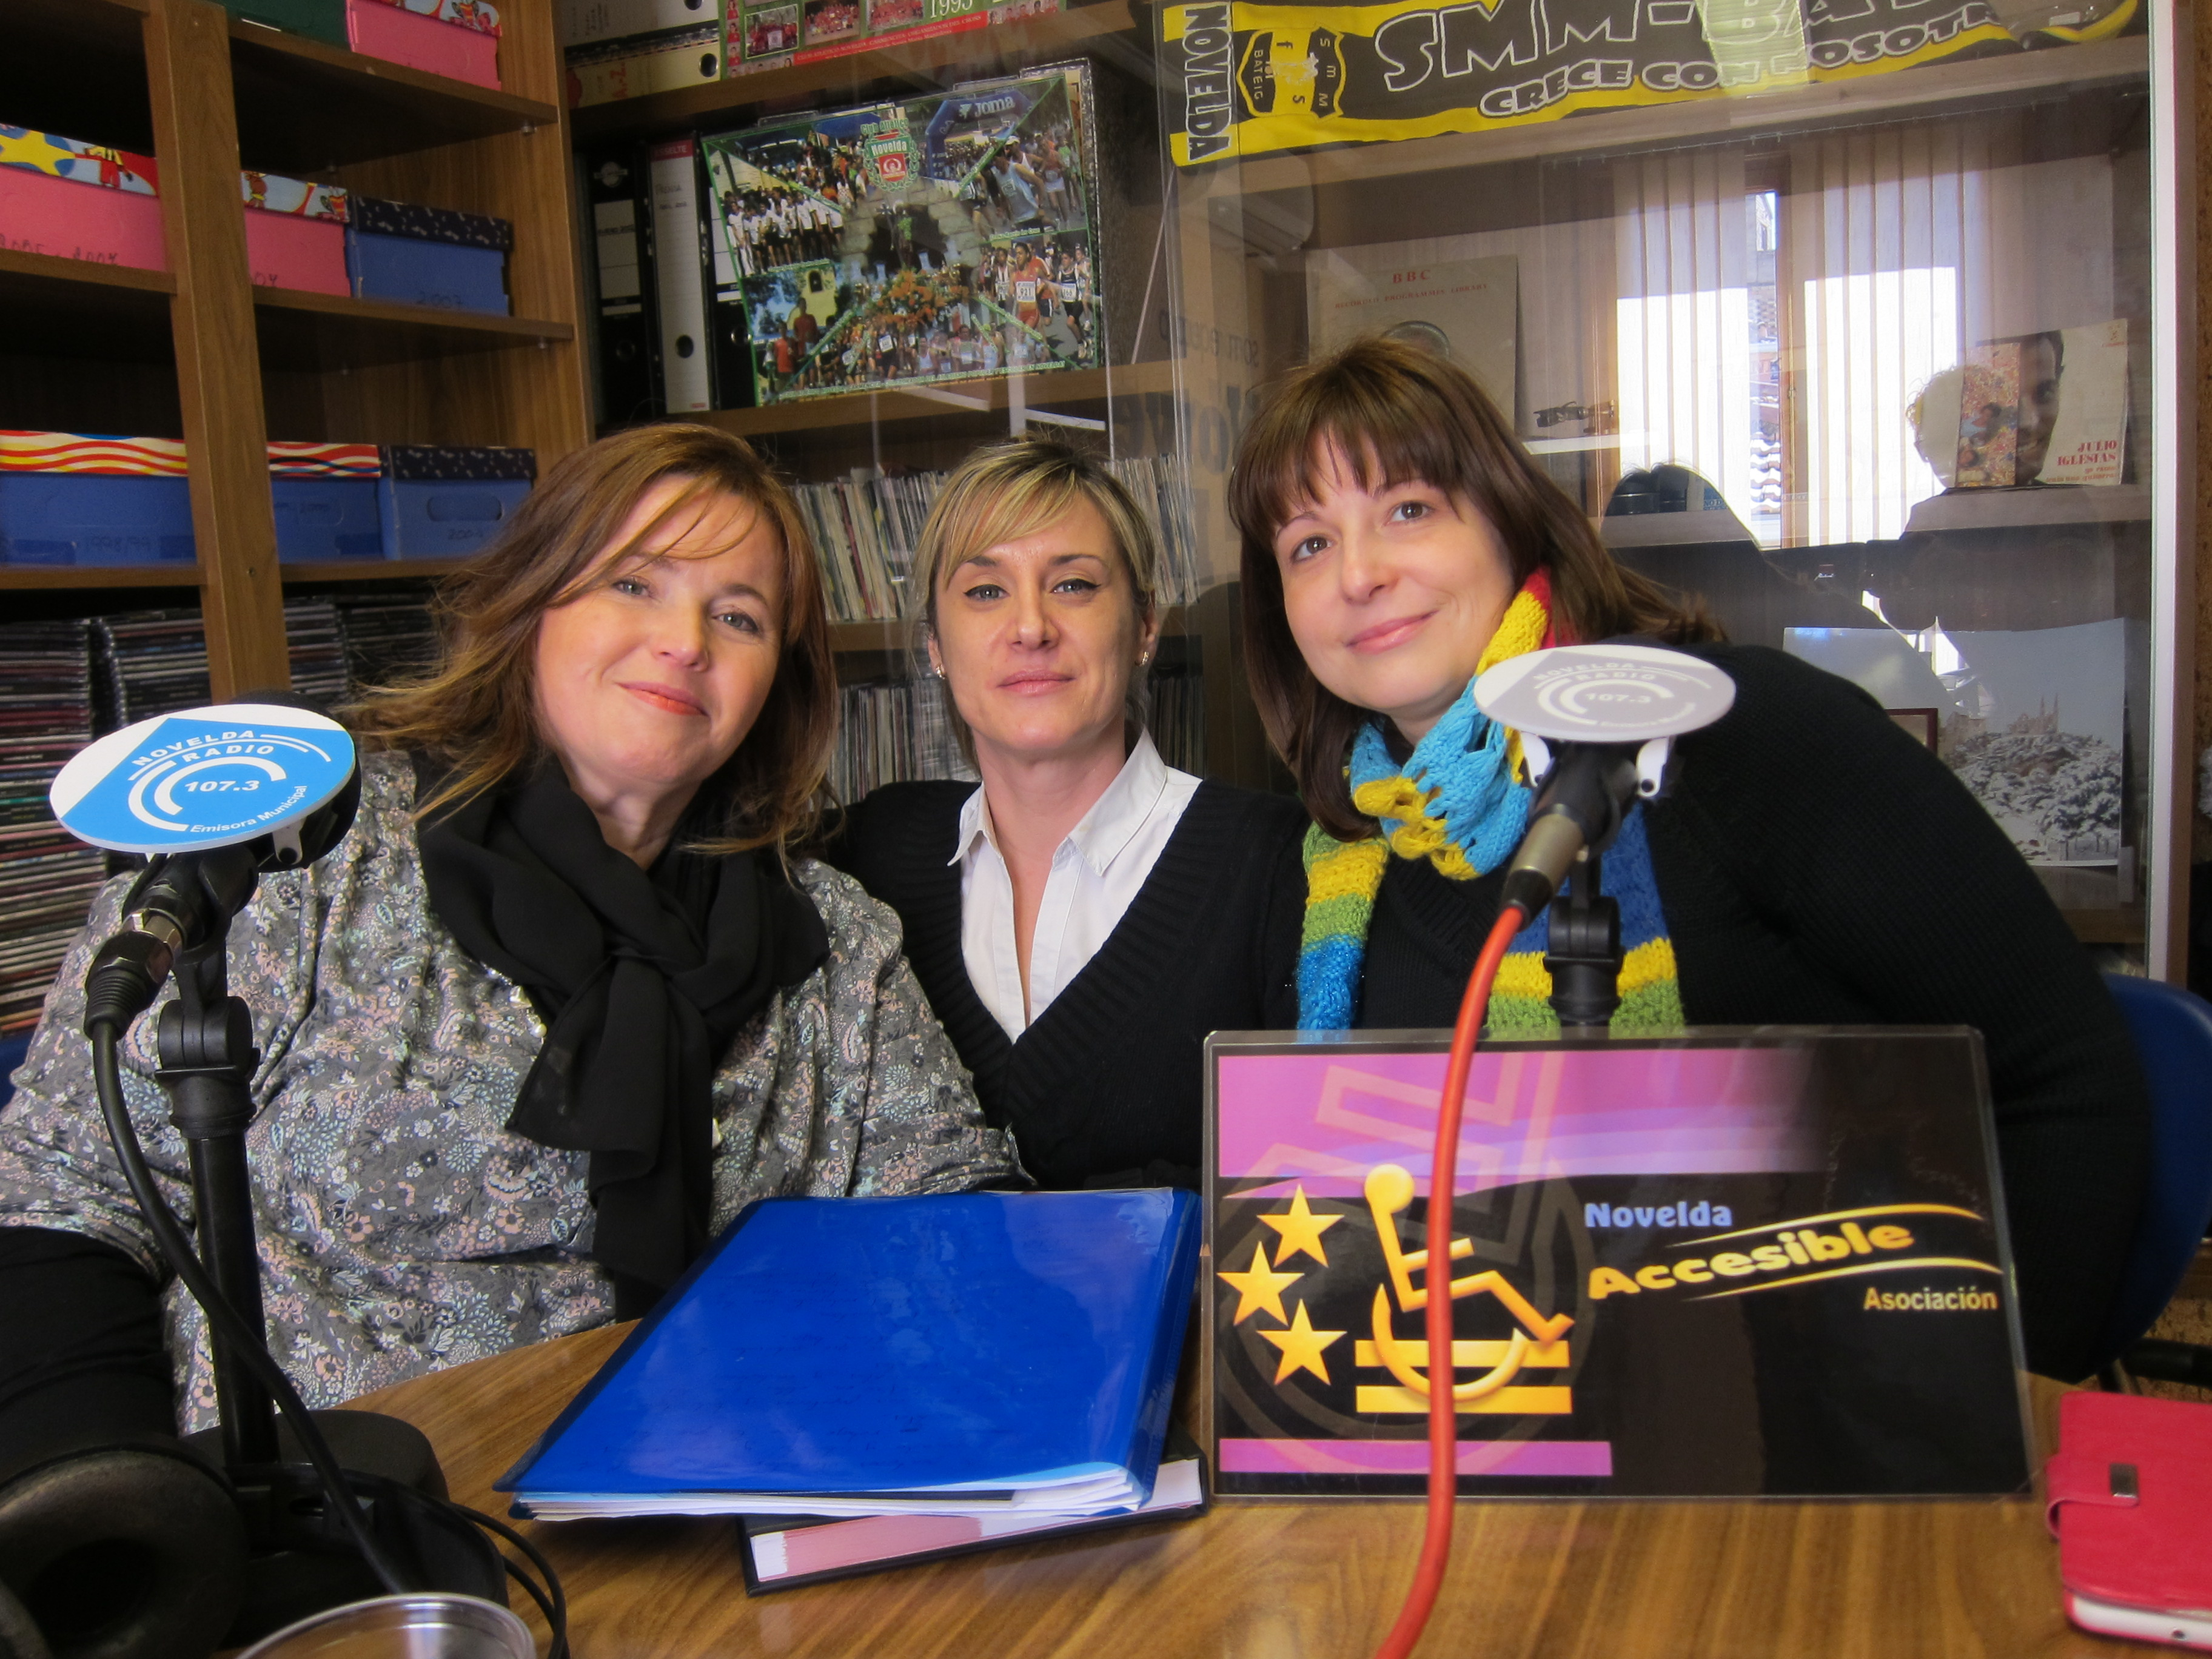 Miembros de la asociacion Novelda Accesible (MINI)